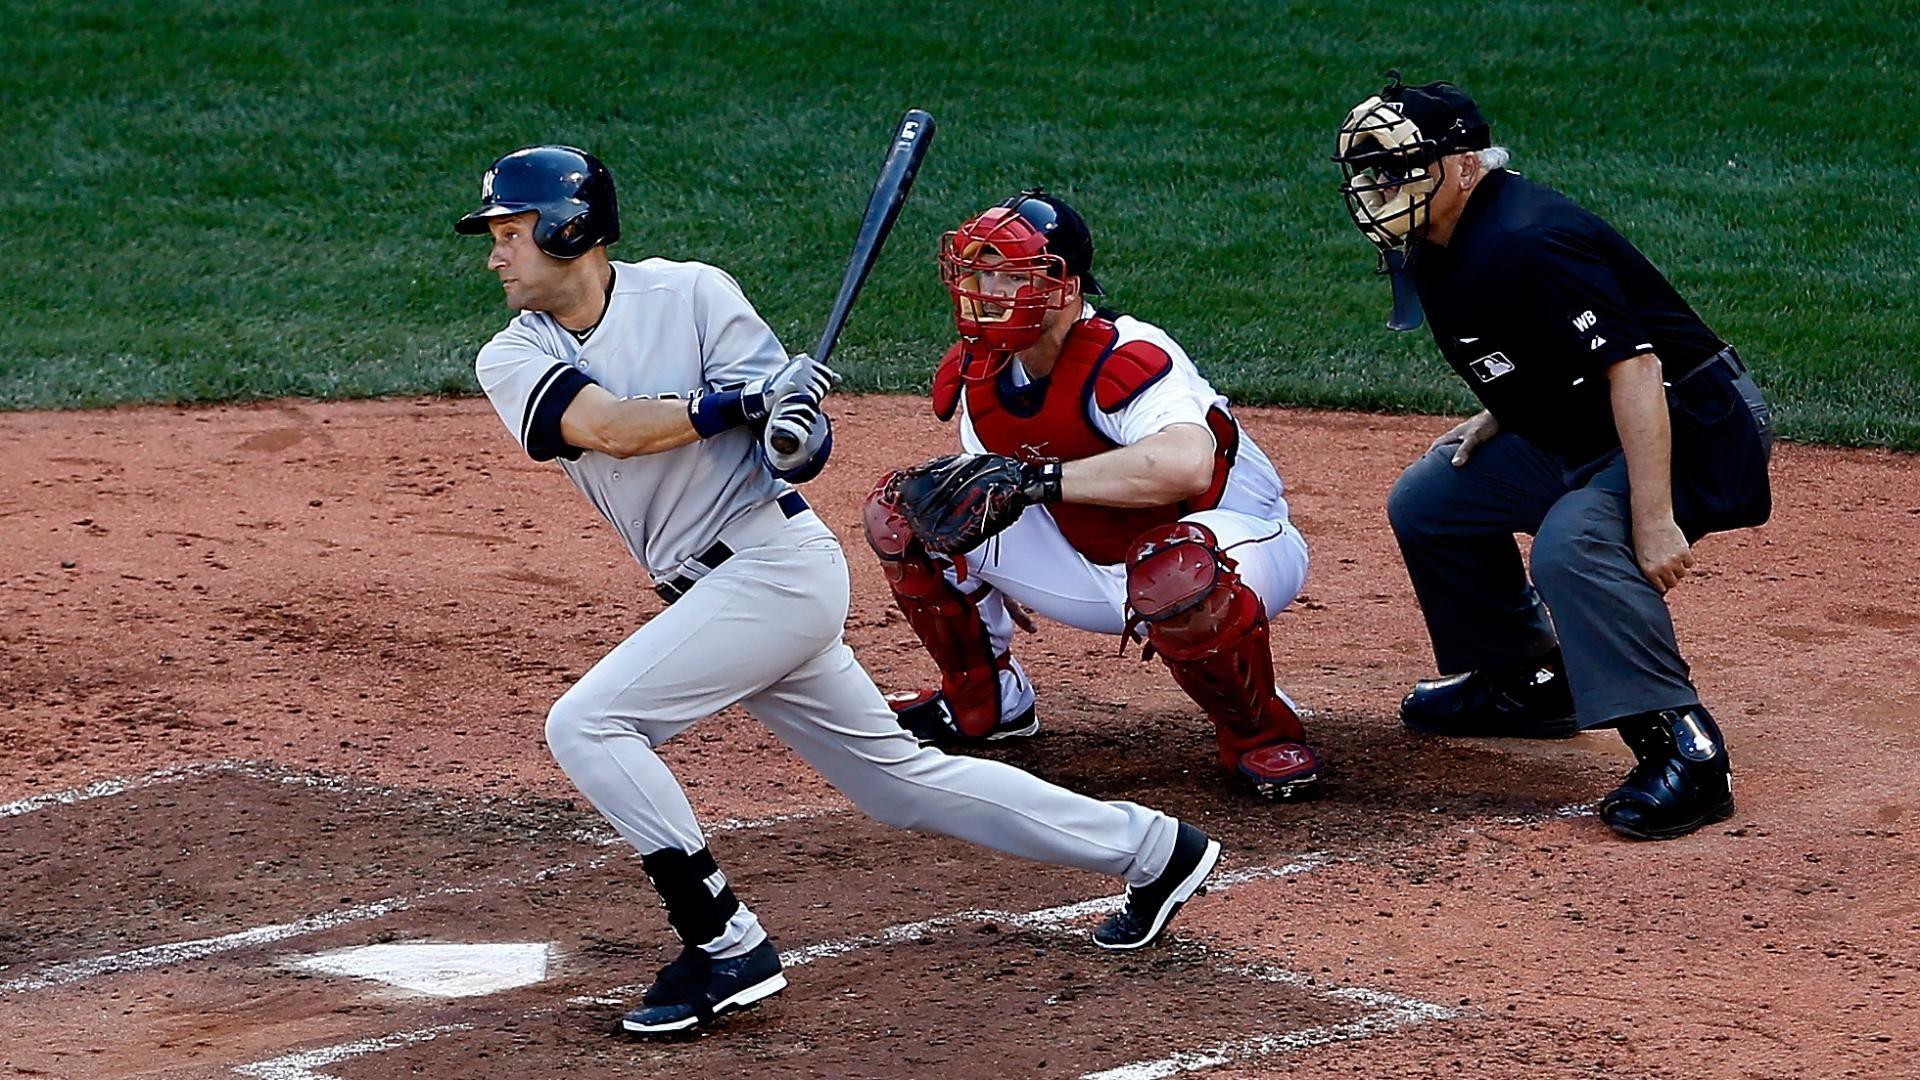 Jeter Hits RBI Single In Final At-Bat